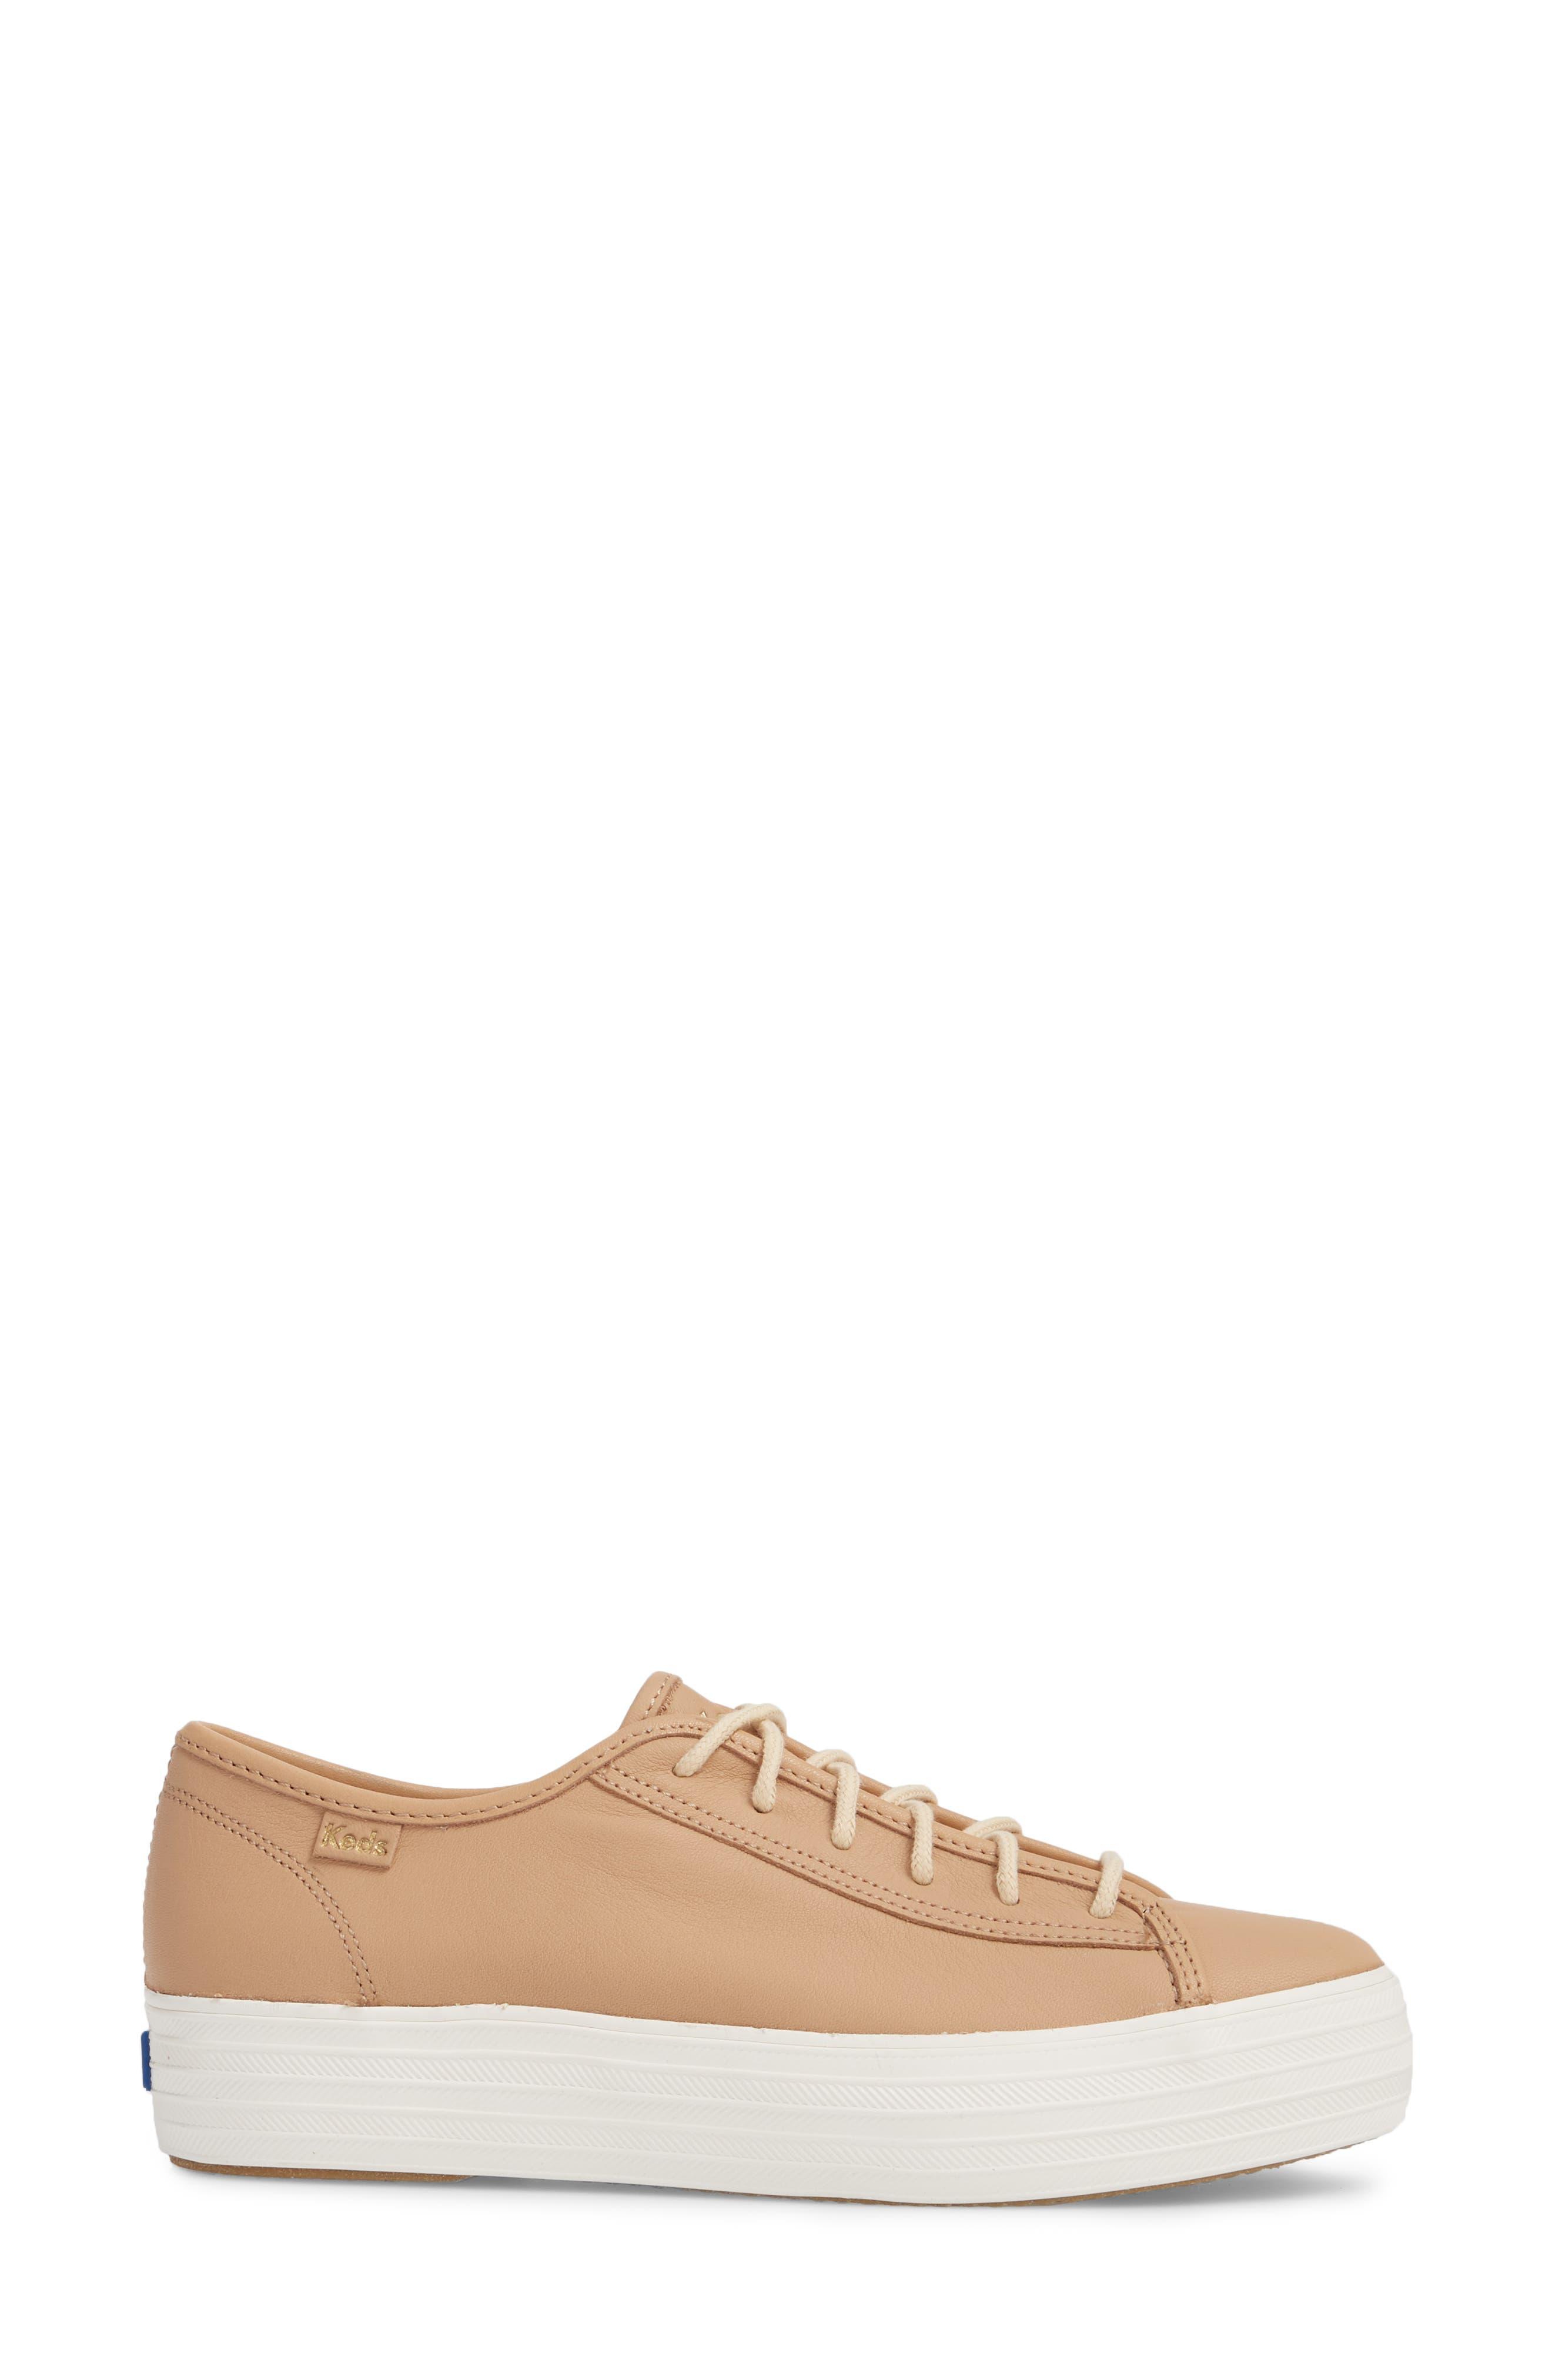 Triple Kick Platform Sneaker,                             Alternate thumbnail 3, color,                             200